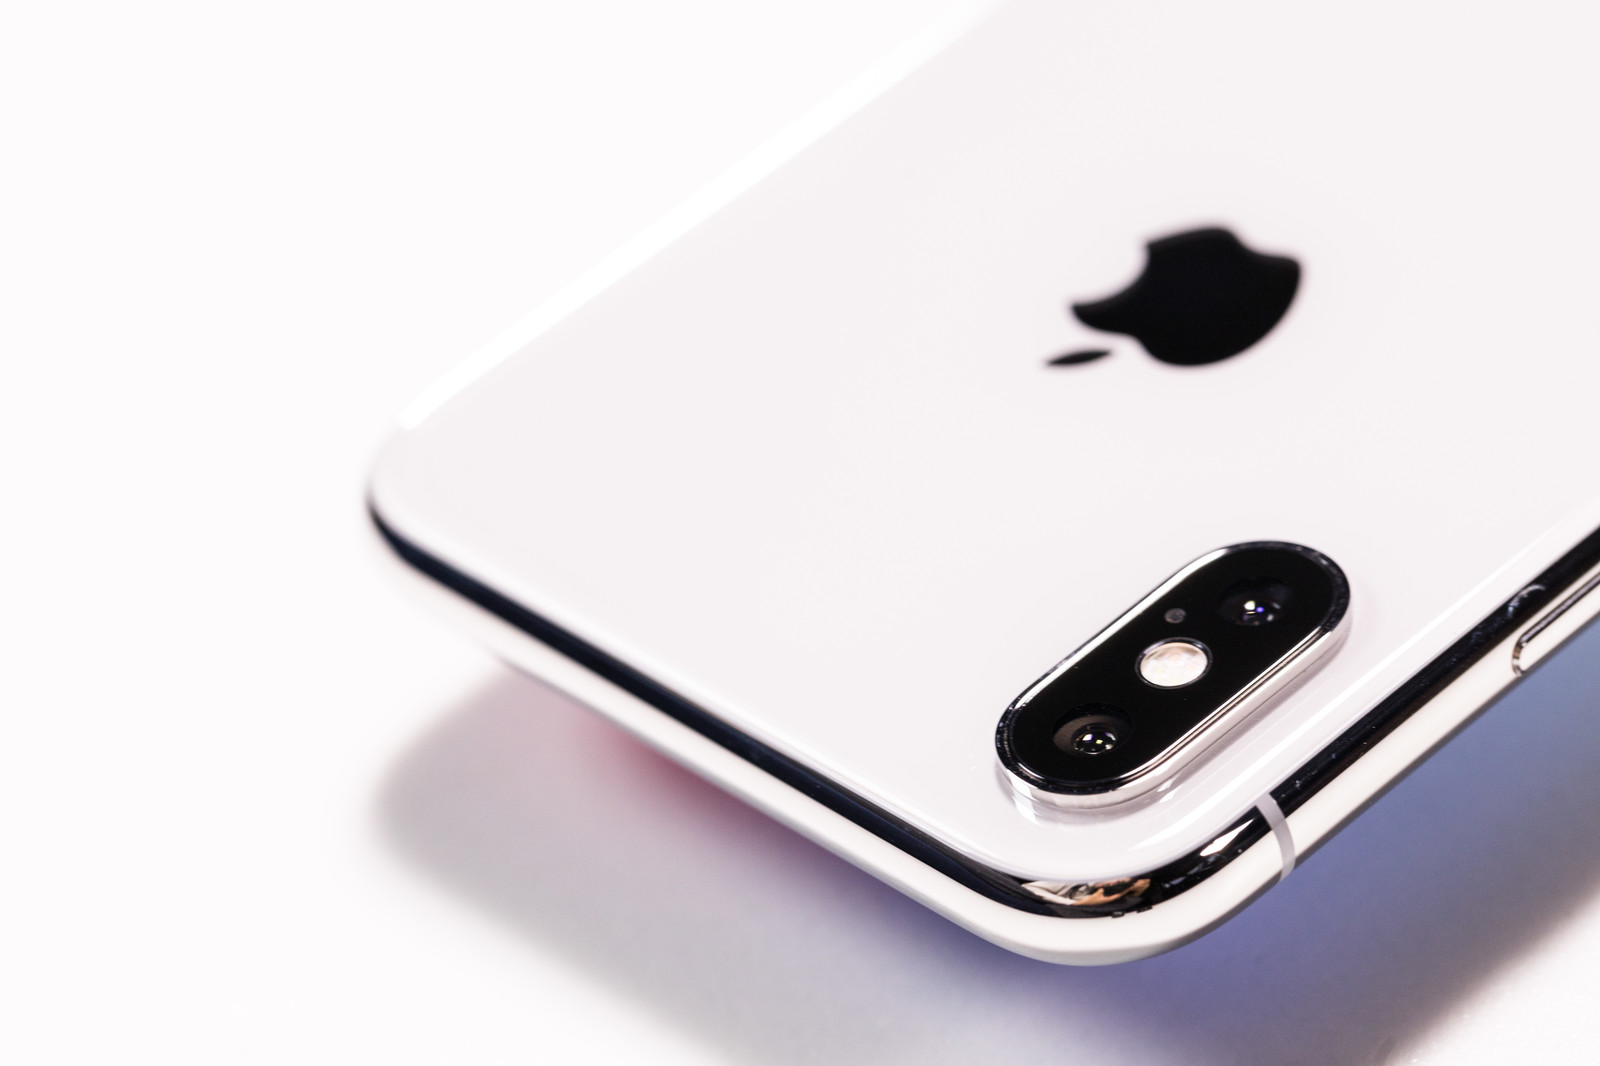 iphone xs xs maxをauで機種変更 乗り換えする方法 iphone格安sim通信